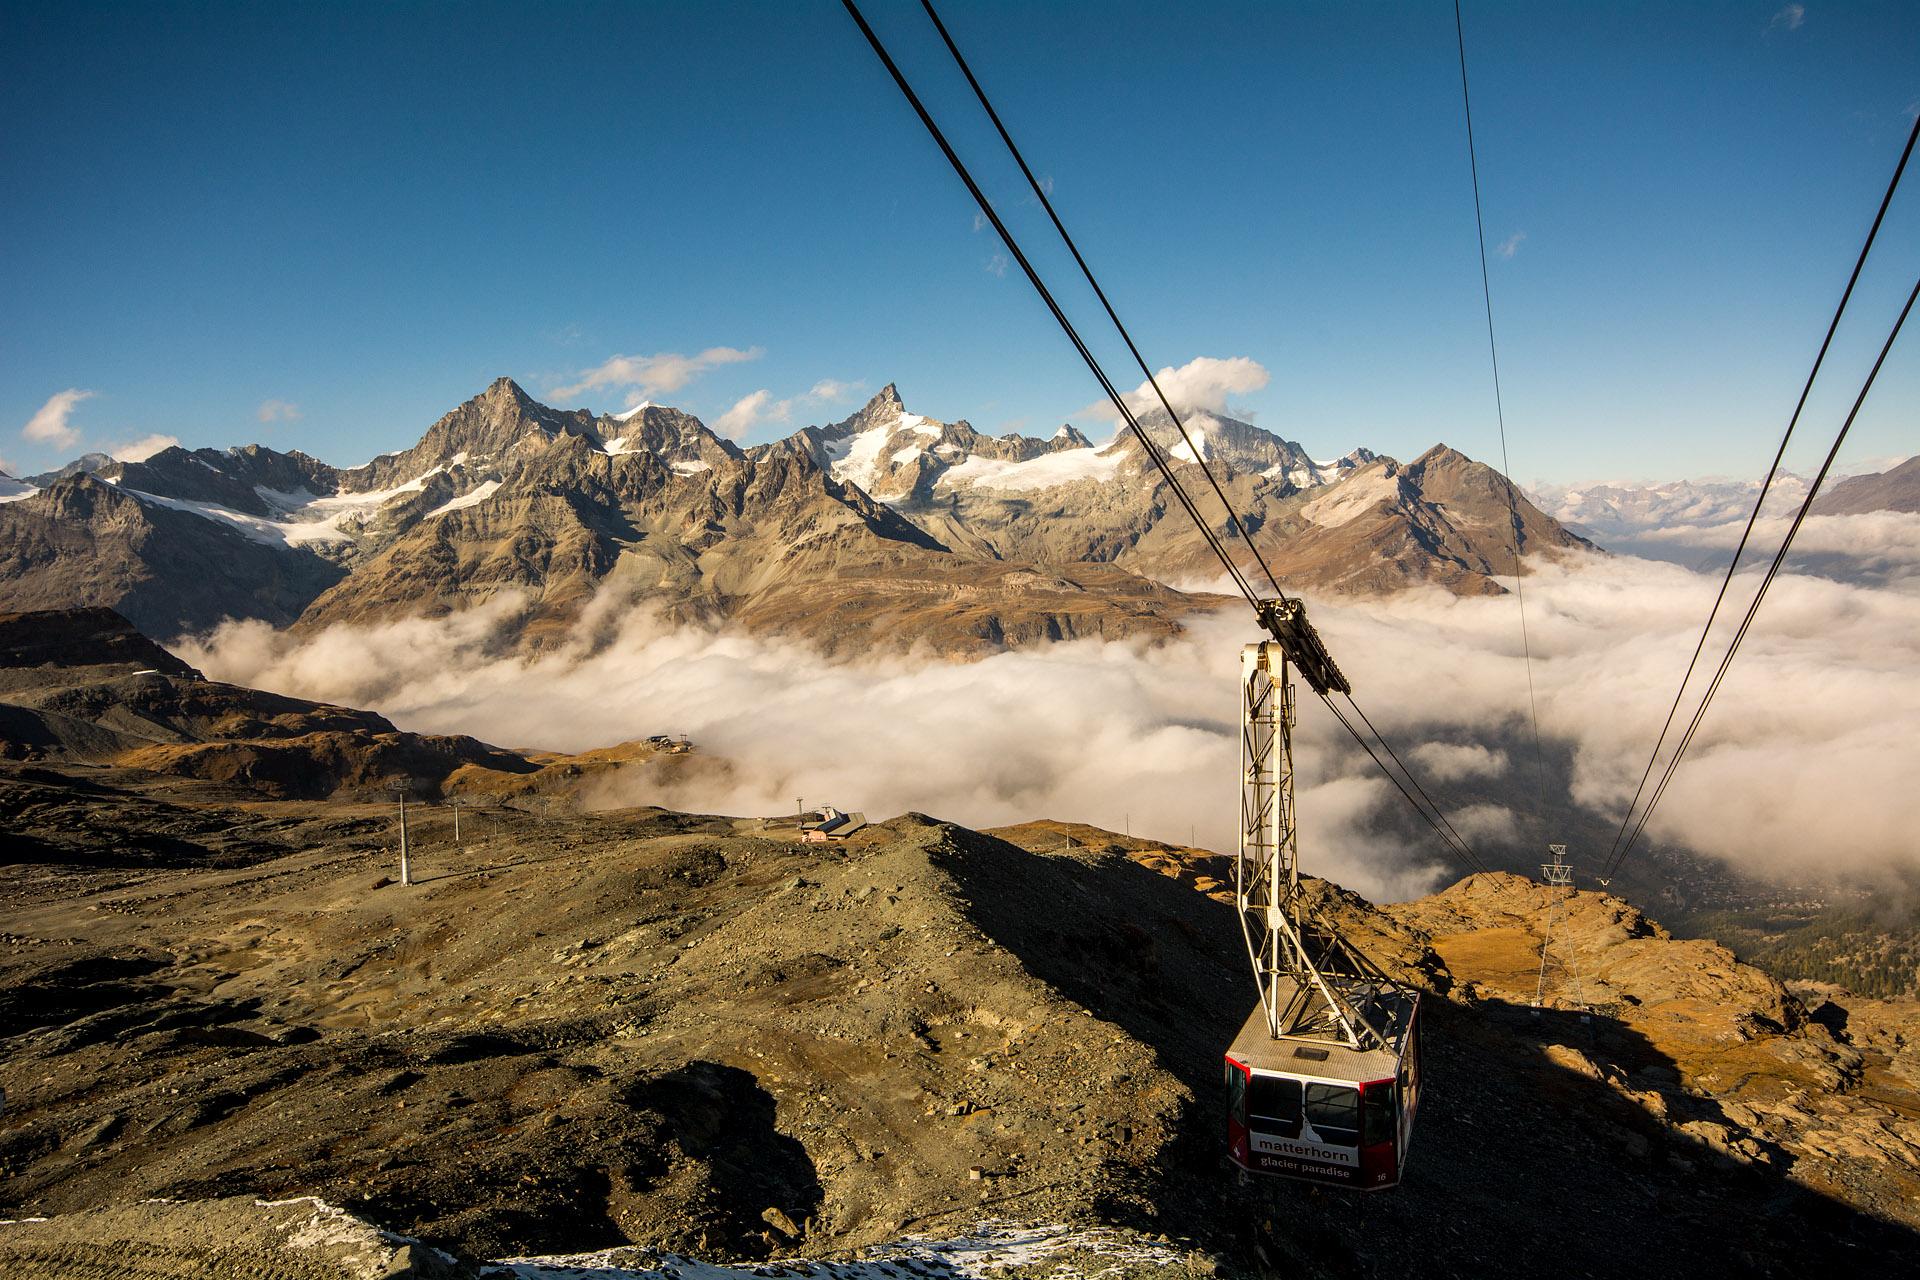 Glacier Paradise lift to Klein Matterhorn summit